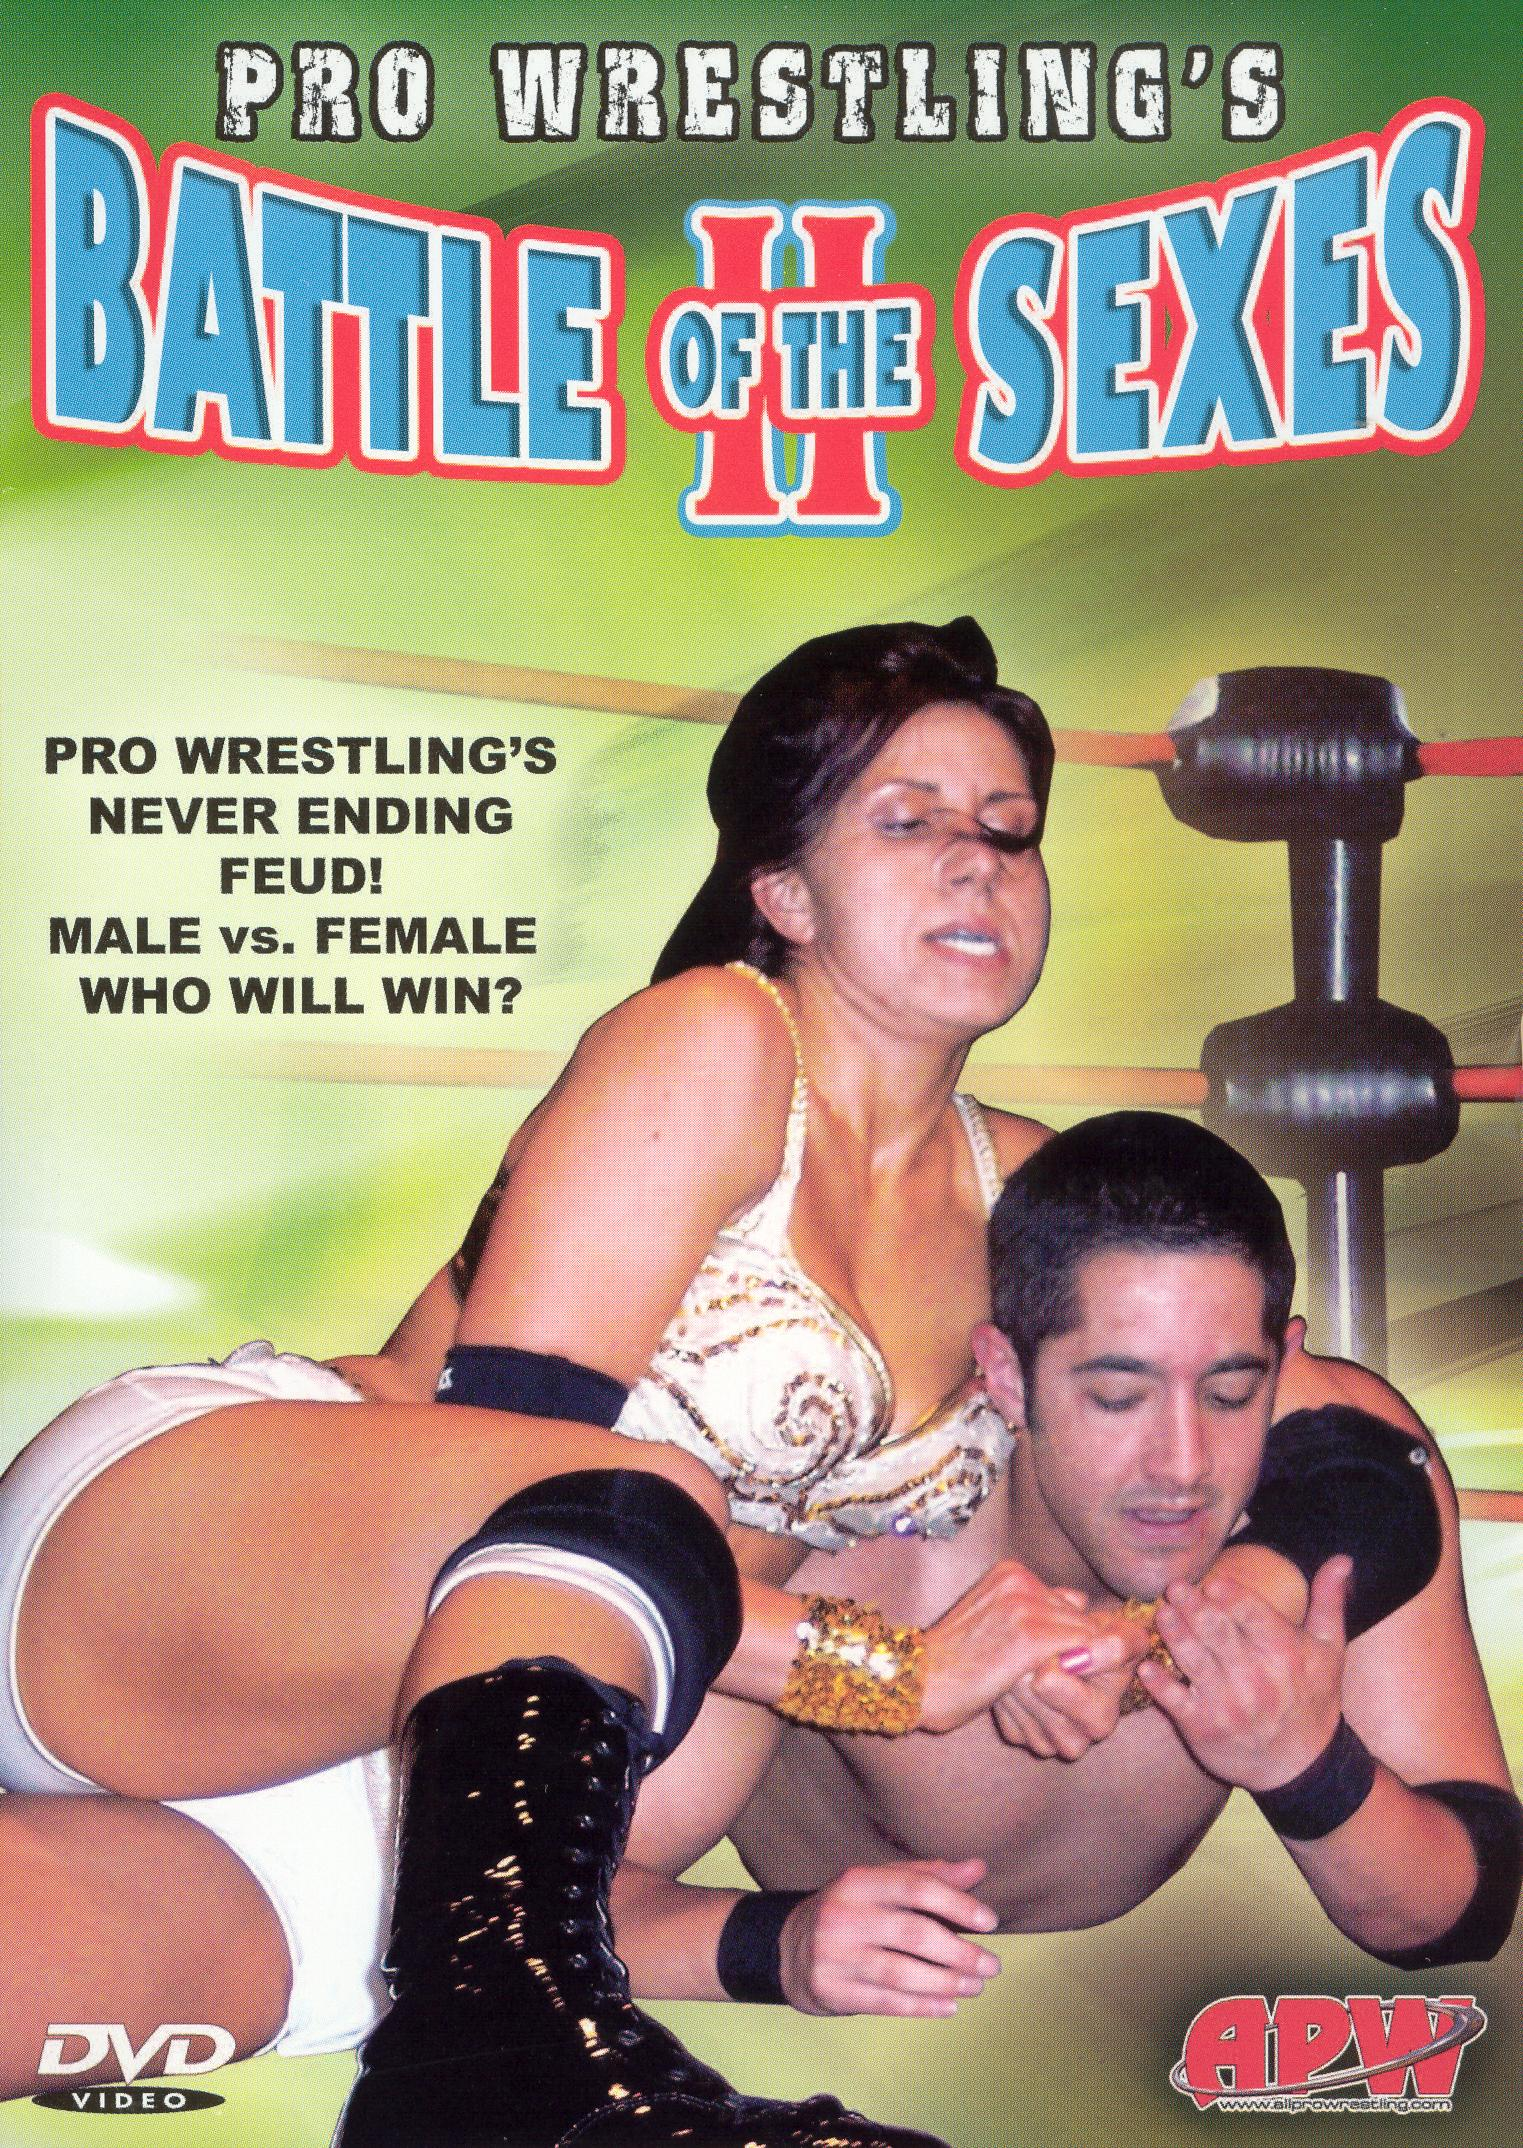 Pro Wrestling's Battle of the Sexes, Vol. 2